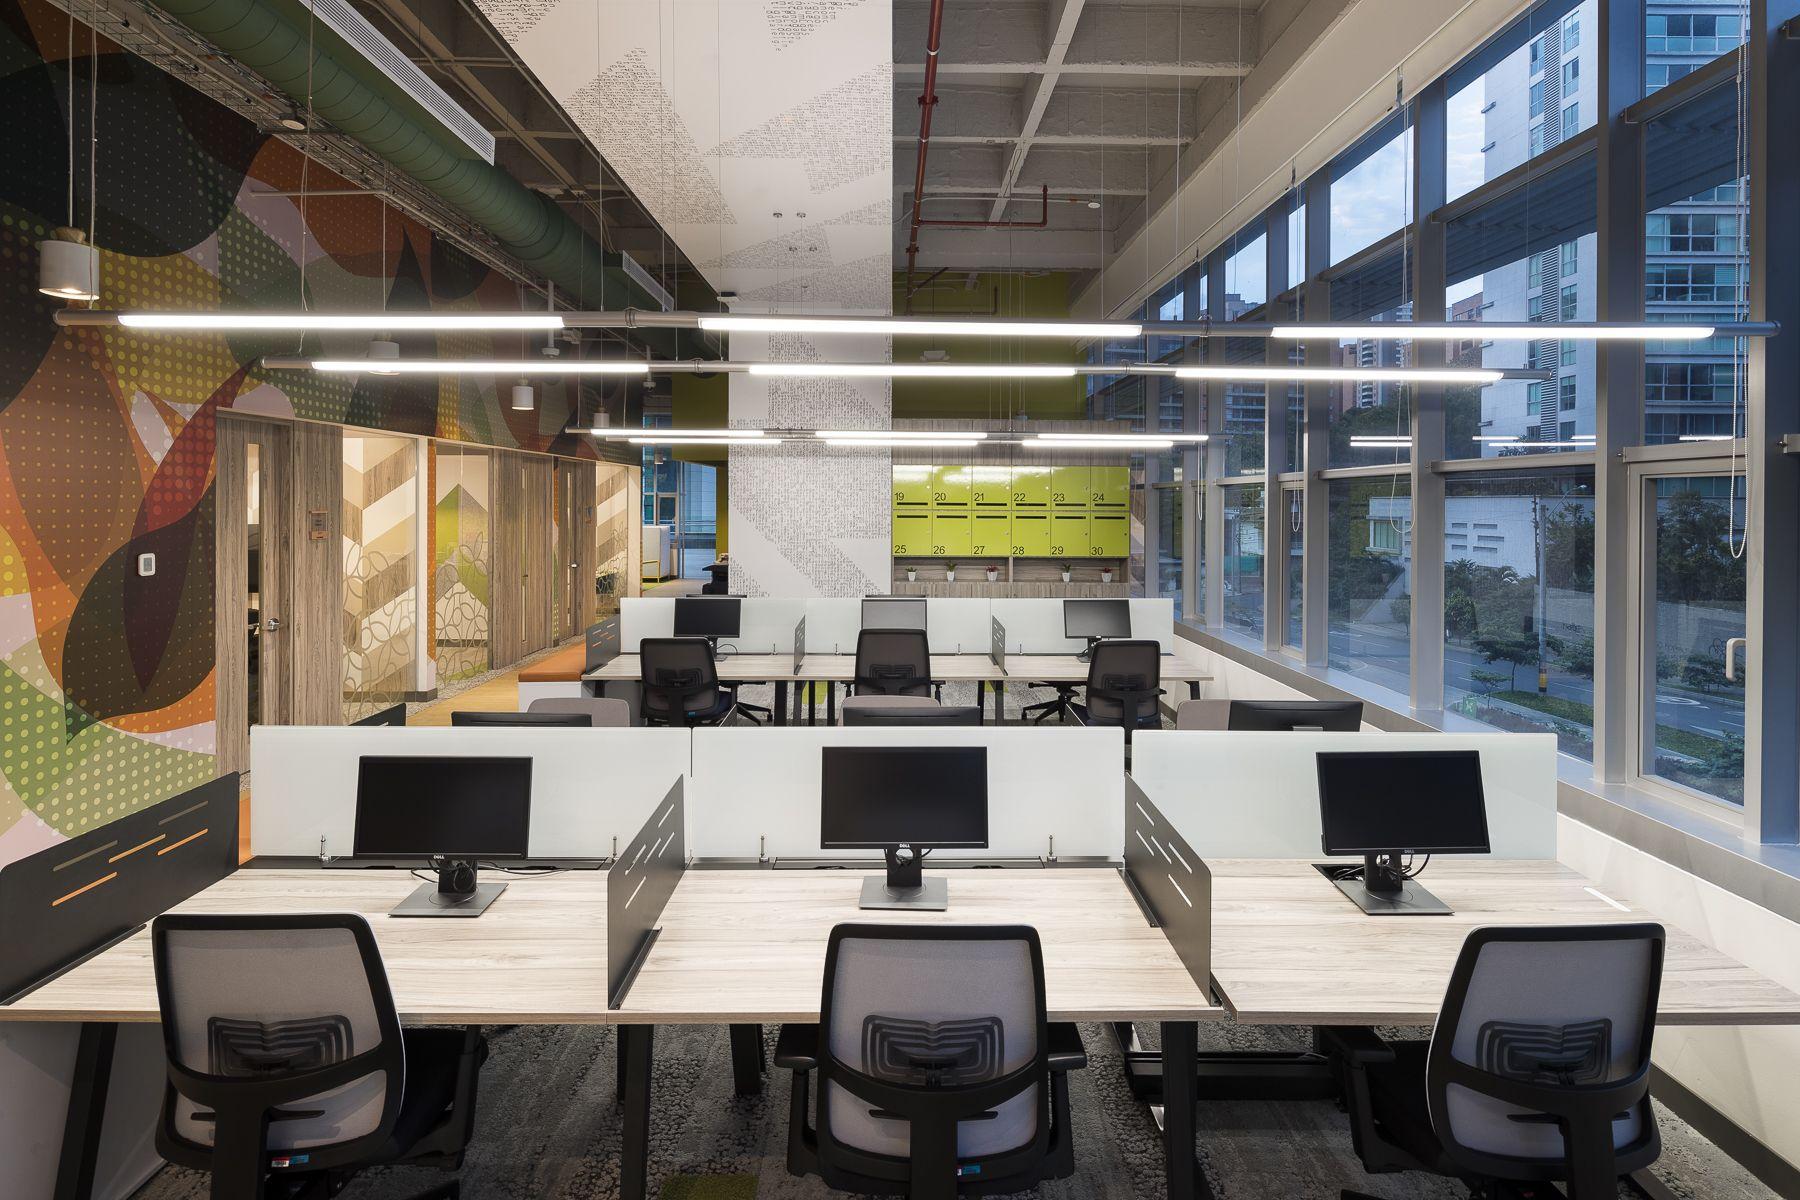 Oficinas Microsoft Medellín Diseño Arquitectura e Interiores